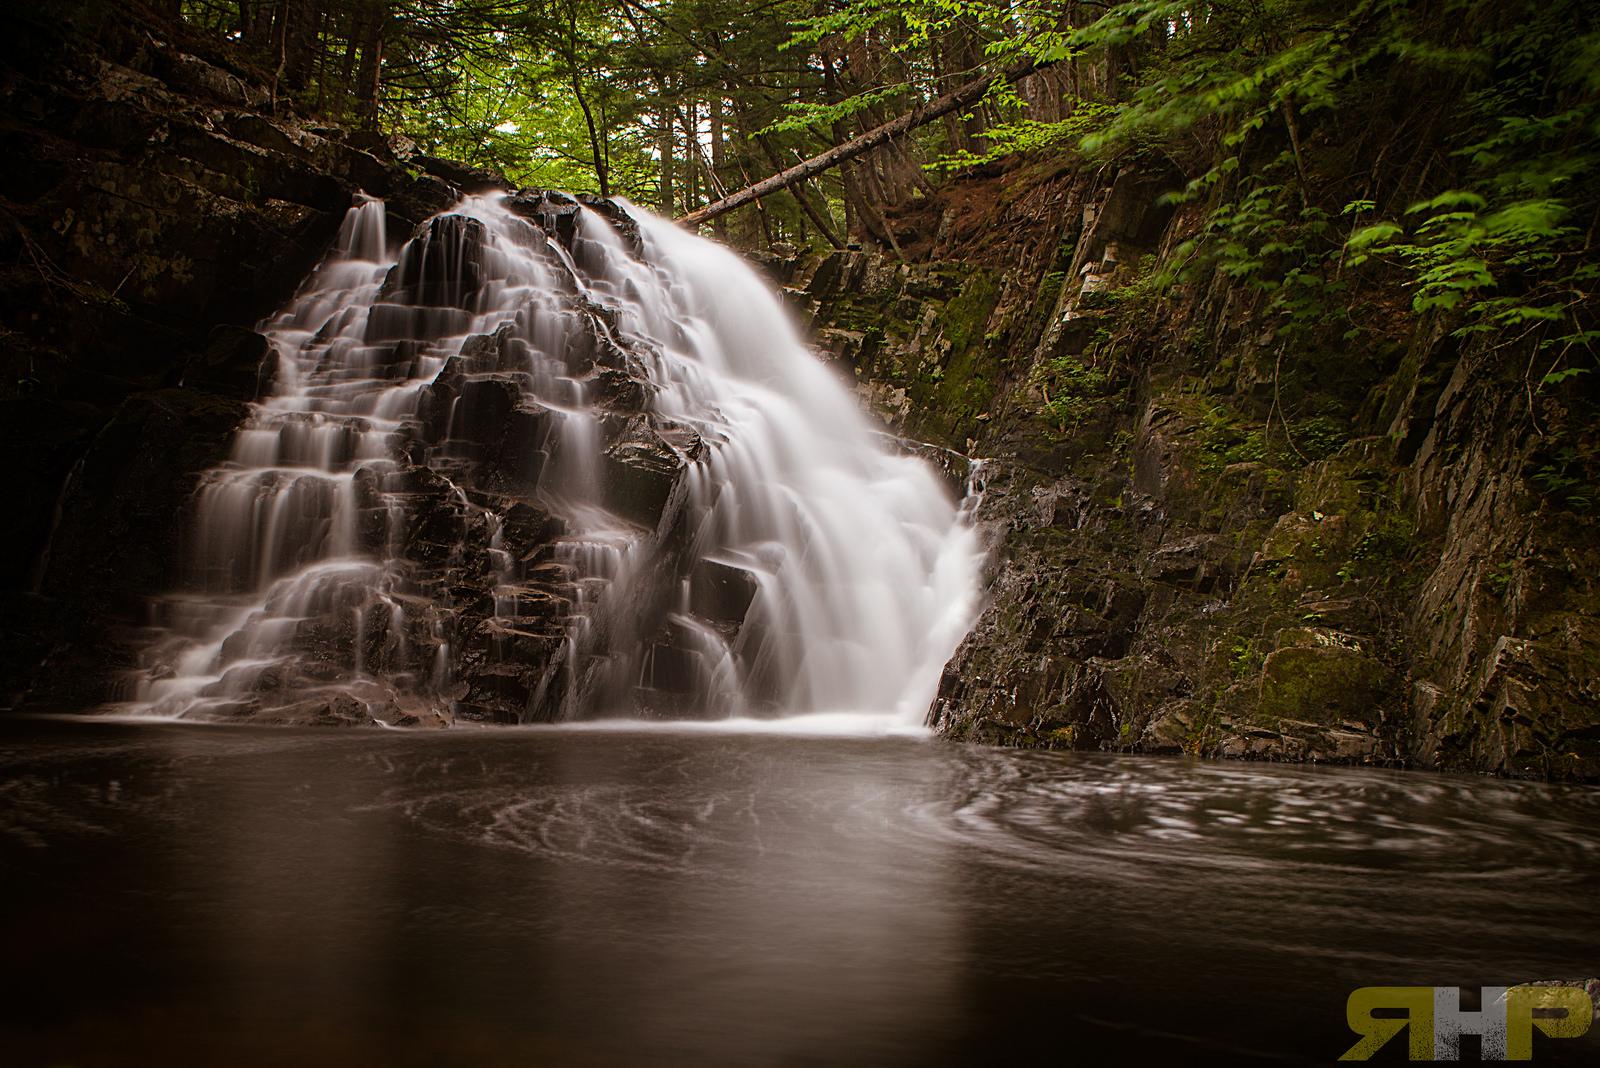 Dawson Brook Falls Moody (Explored #186 on Jun 21, 2014)